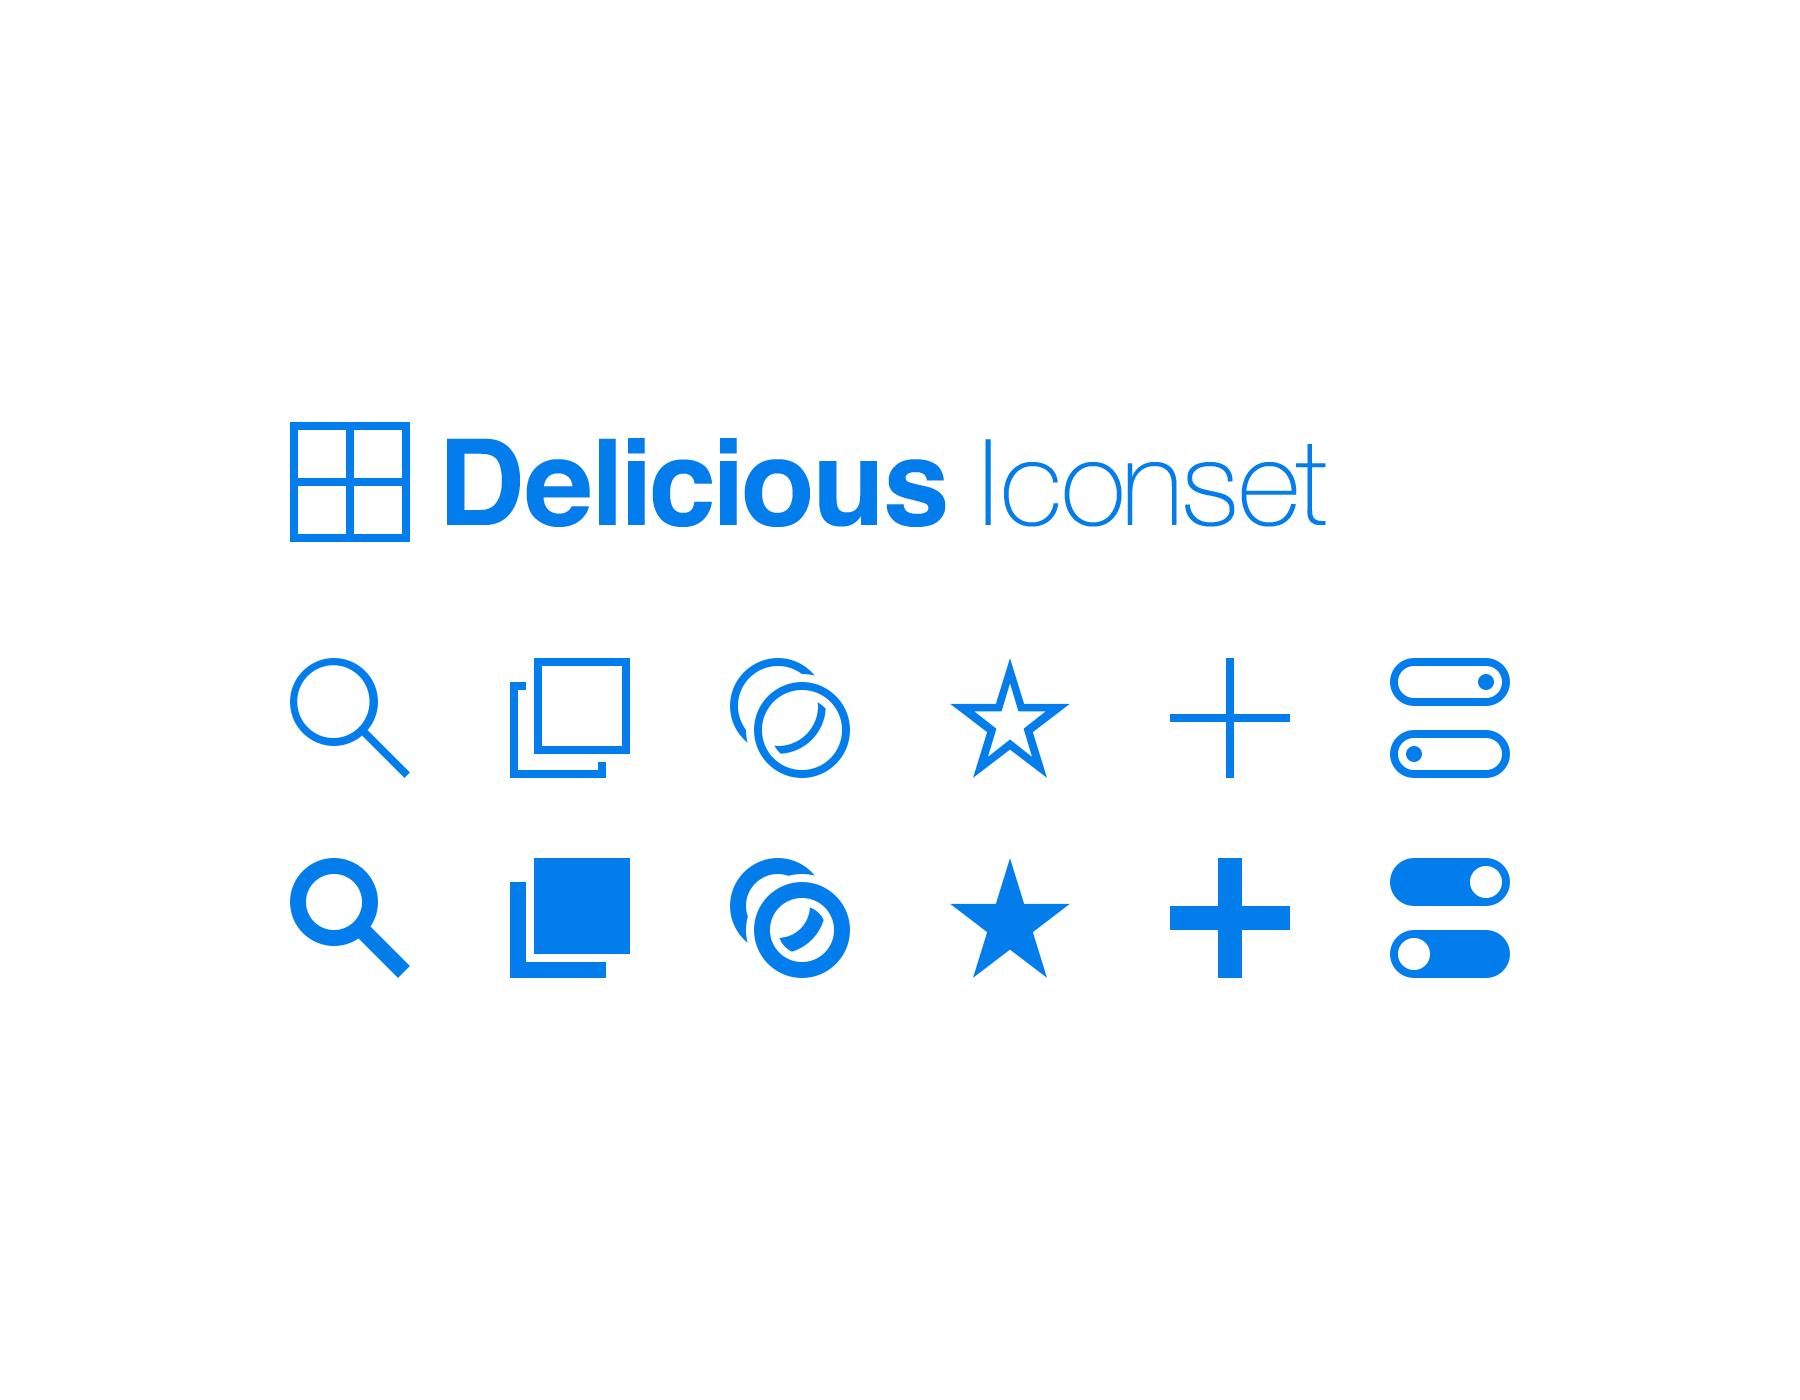 Delicious Iconset